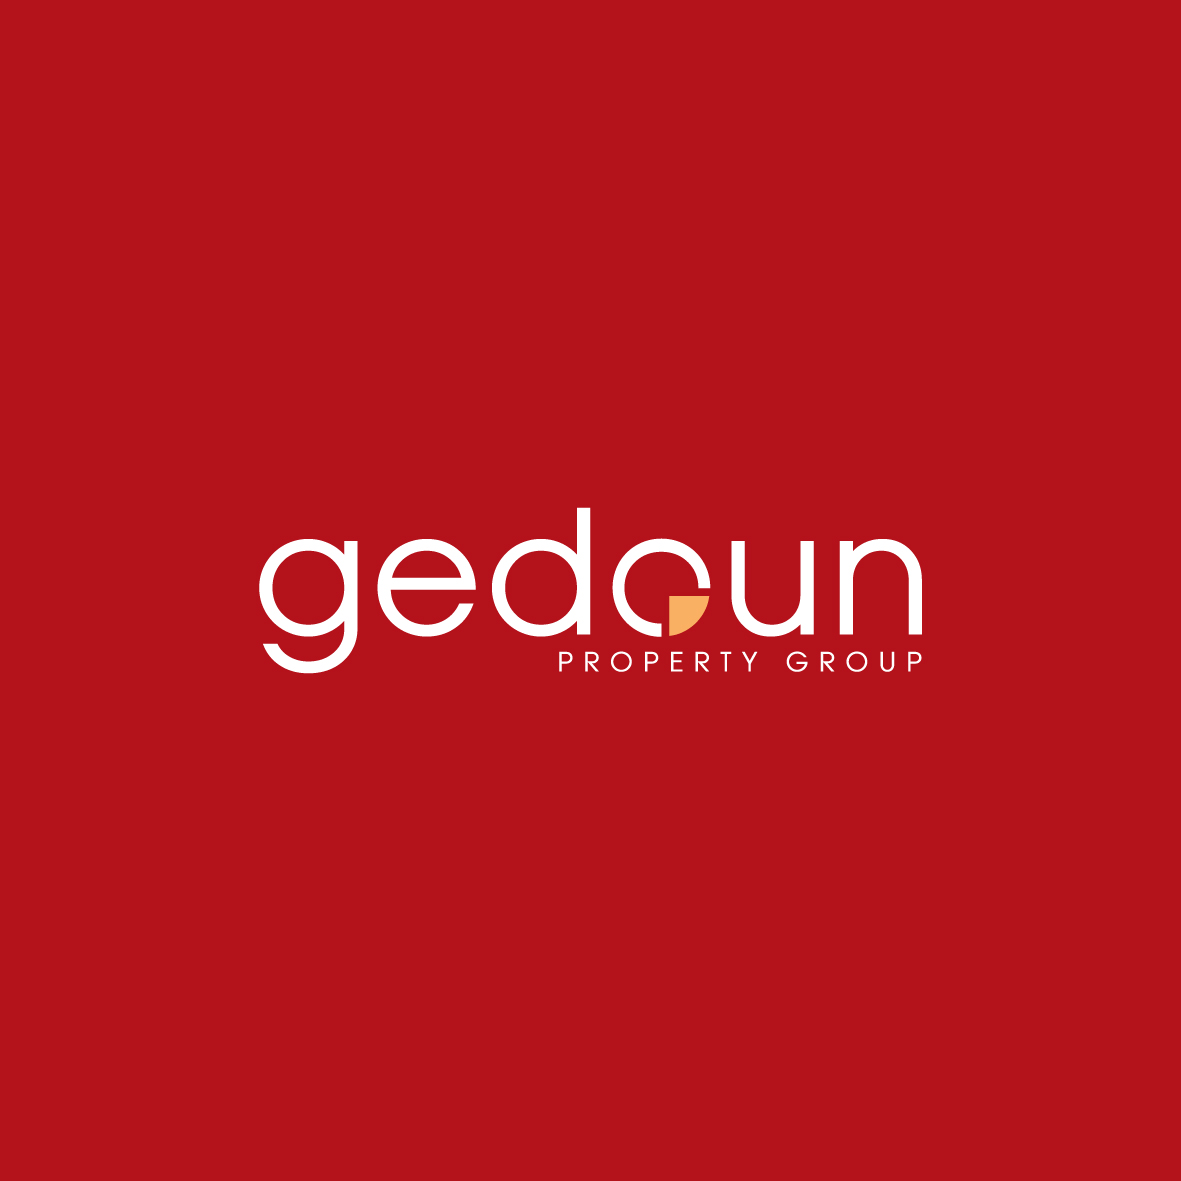 gedoun_property_group_RGB_high_res - Logo.jpg